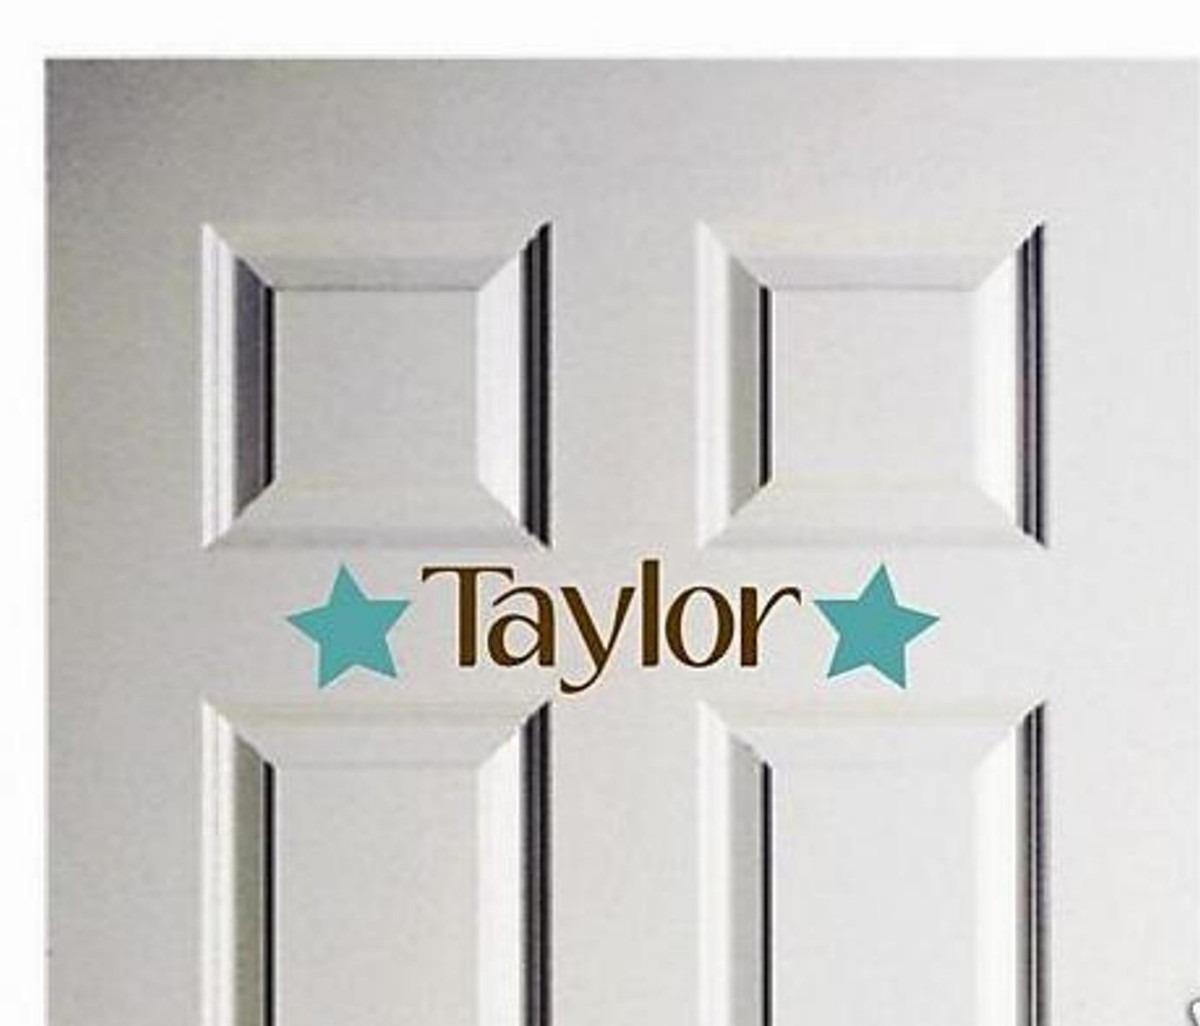 Vinilos decorativos puertas tattoo design bild for Vinilos decorativos para puertas